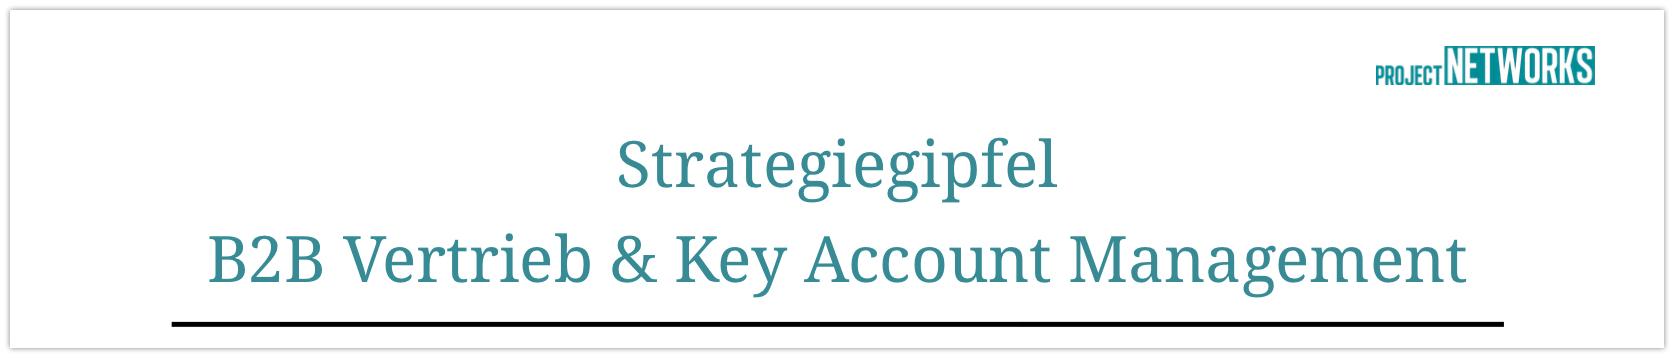 Strategiegipfel B2B Vertrieb und Key Account Management